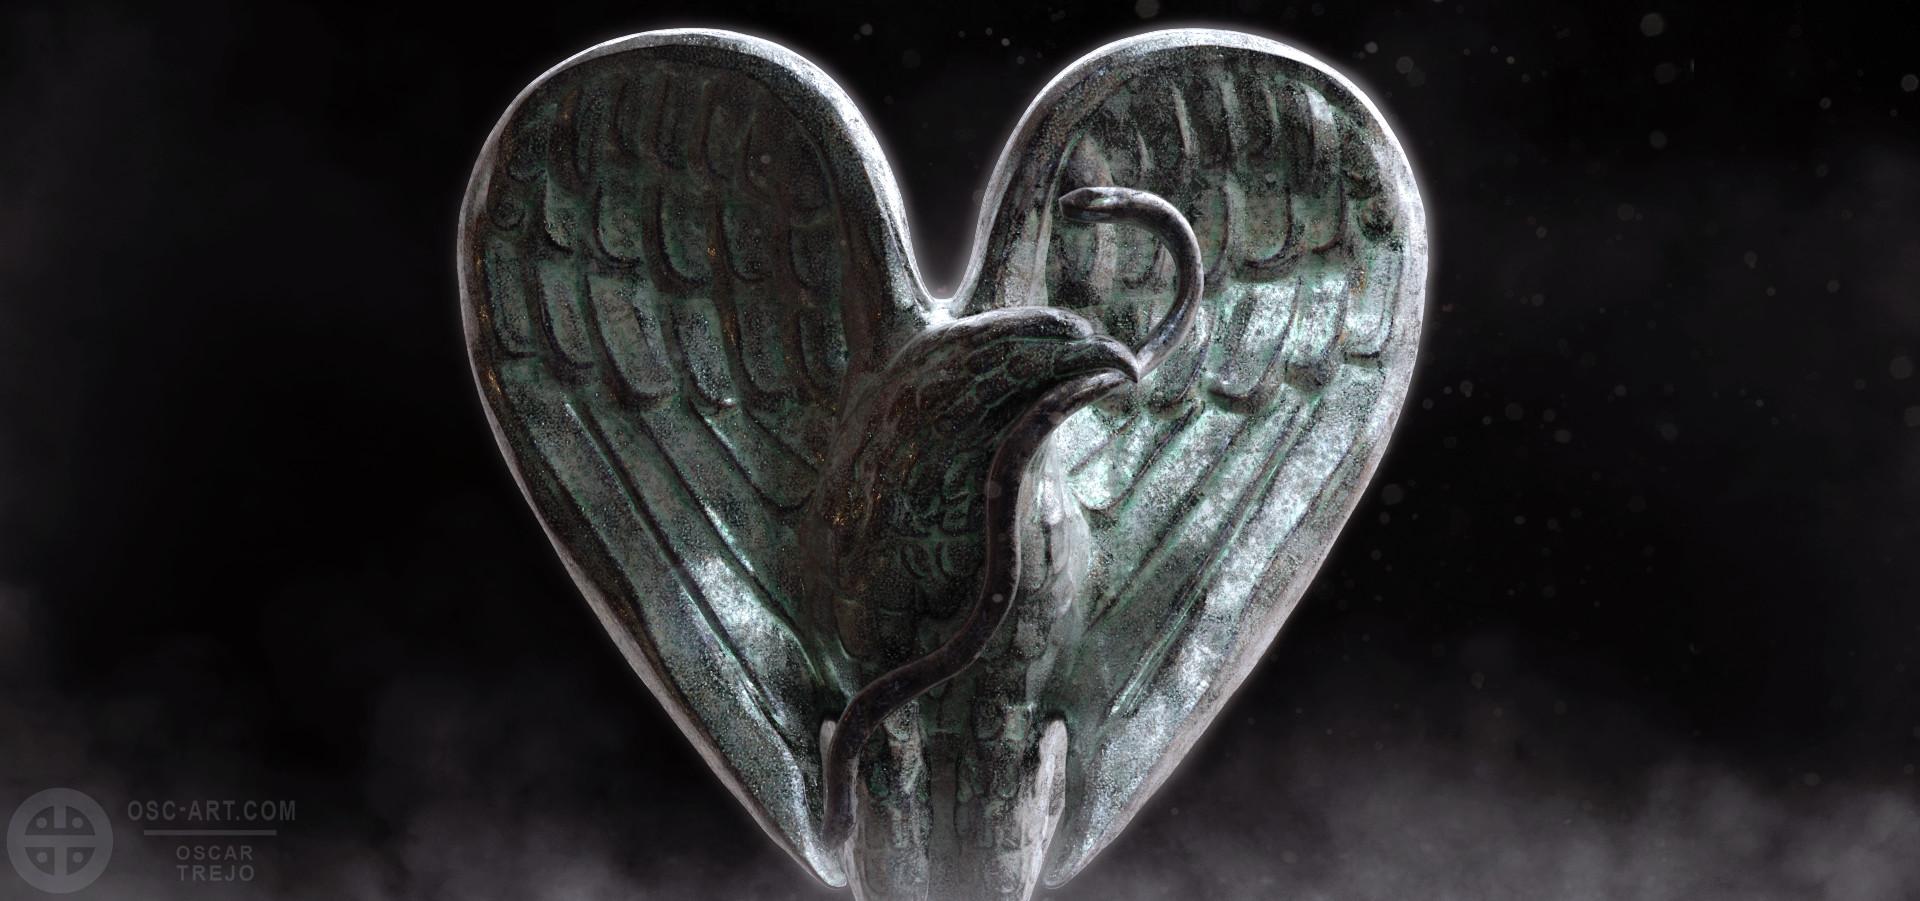 Oscar trejo eagle2